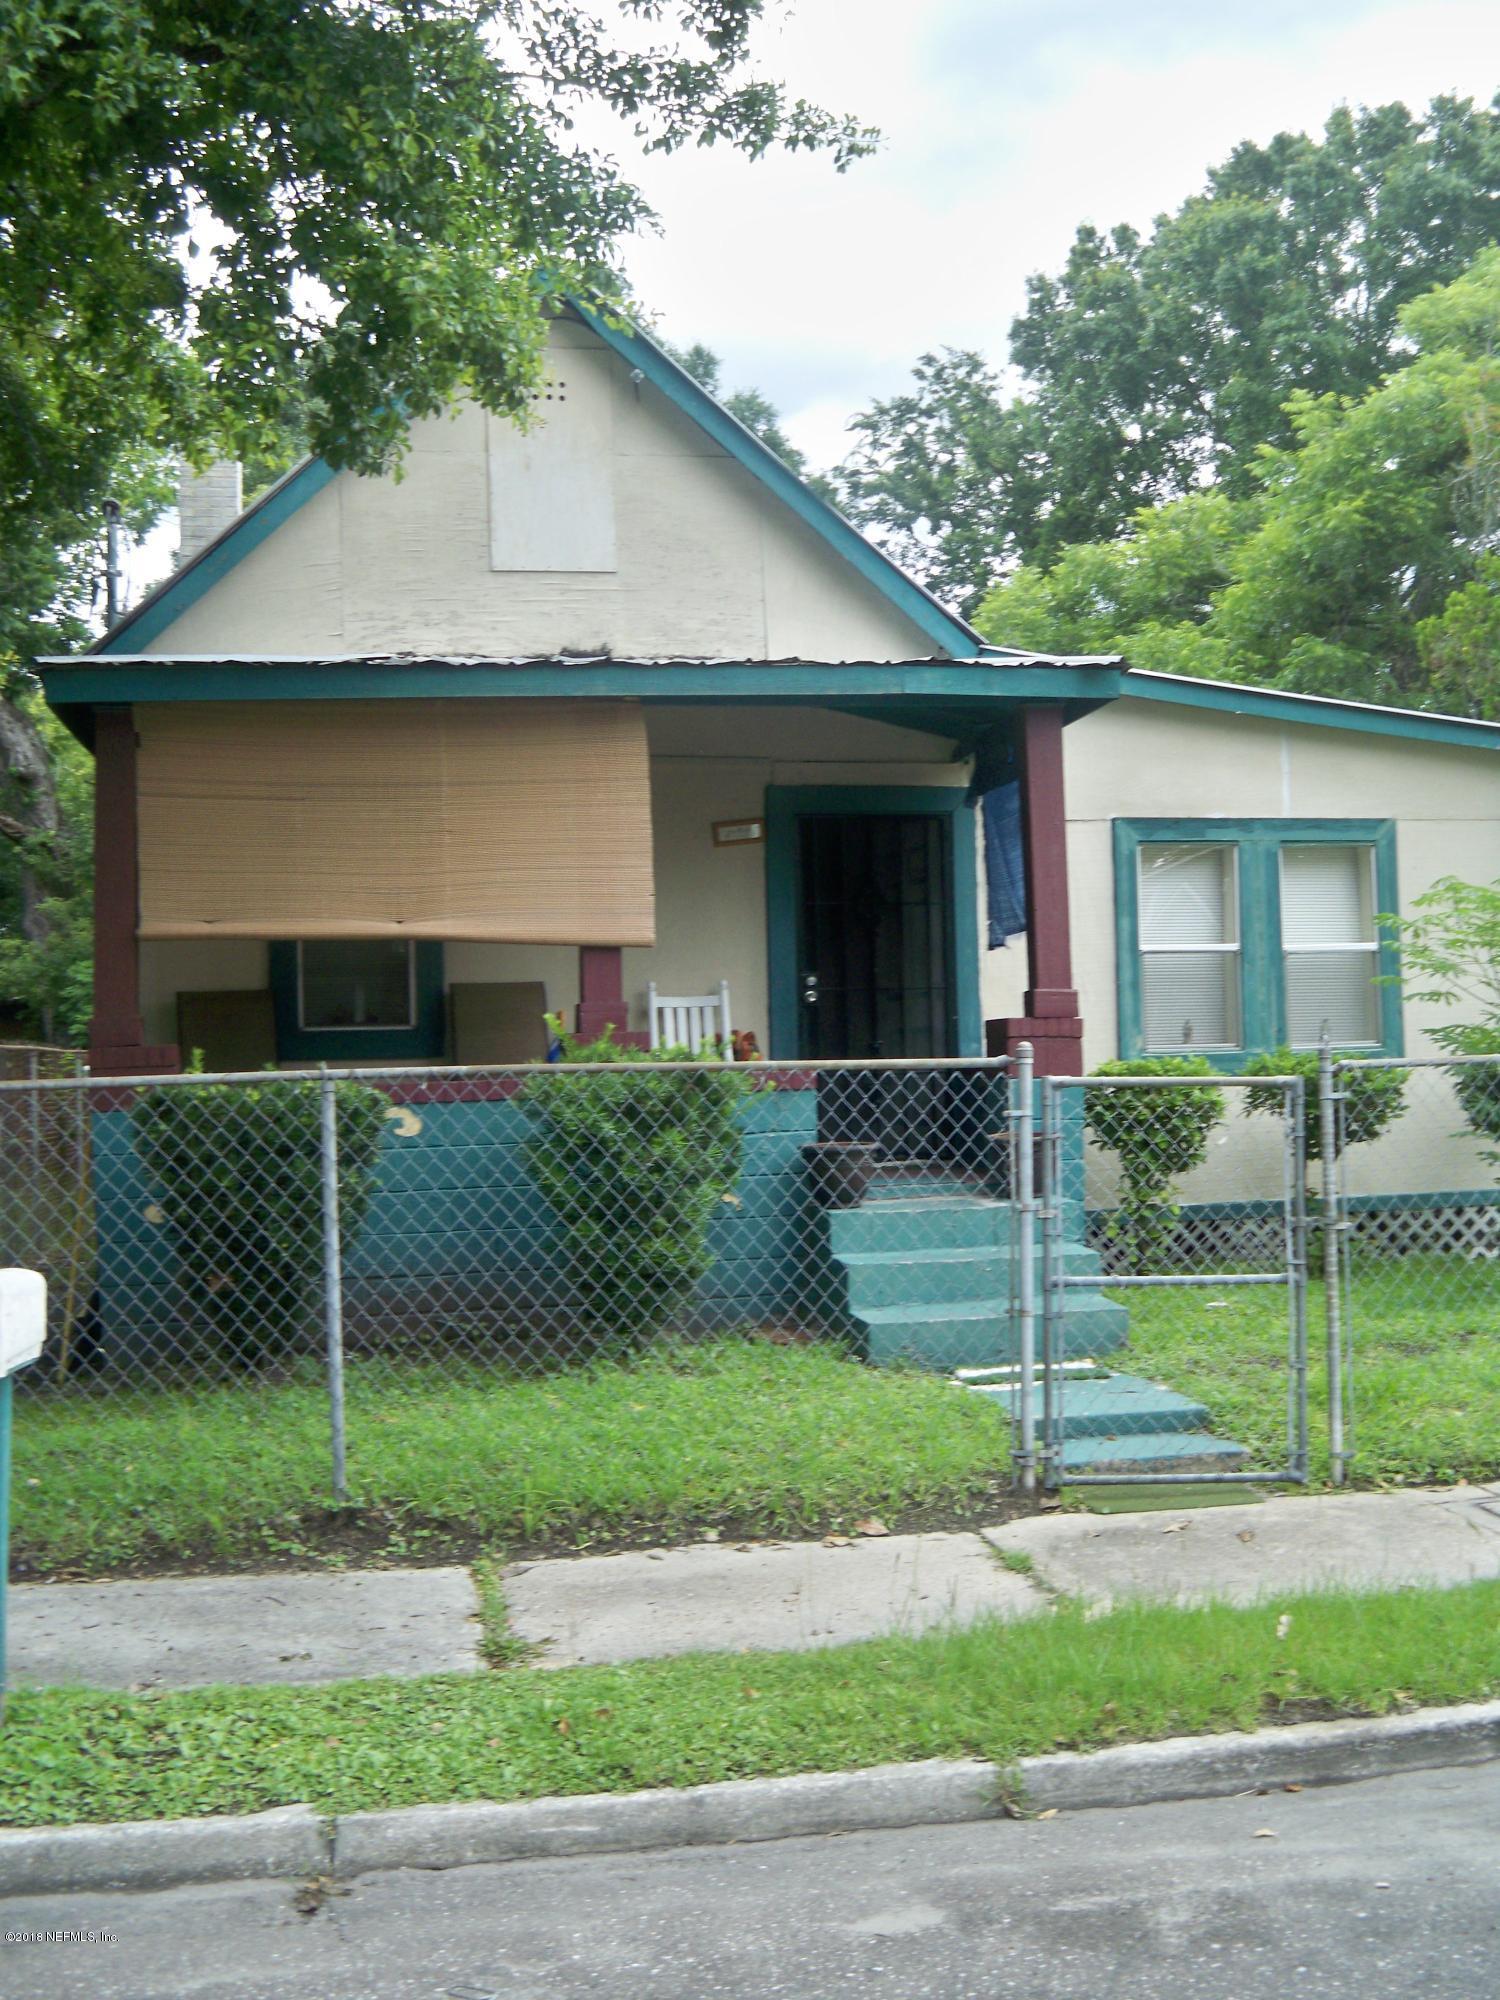 1607 LOGAN, JACKSONVILLE, FLORIDA 32209, 4 Bedrooms Bedrooms, ,1 BathroomBathrooms,Residential - single family,For sale,LOGAN,940406